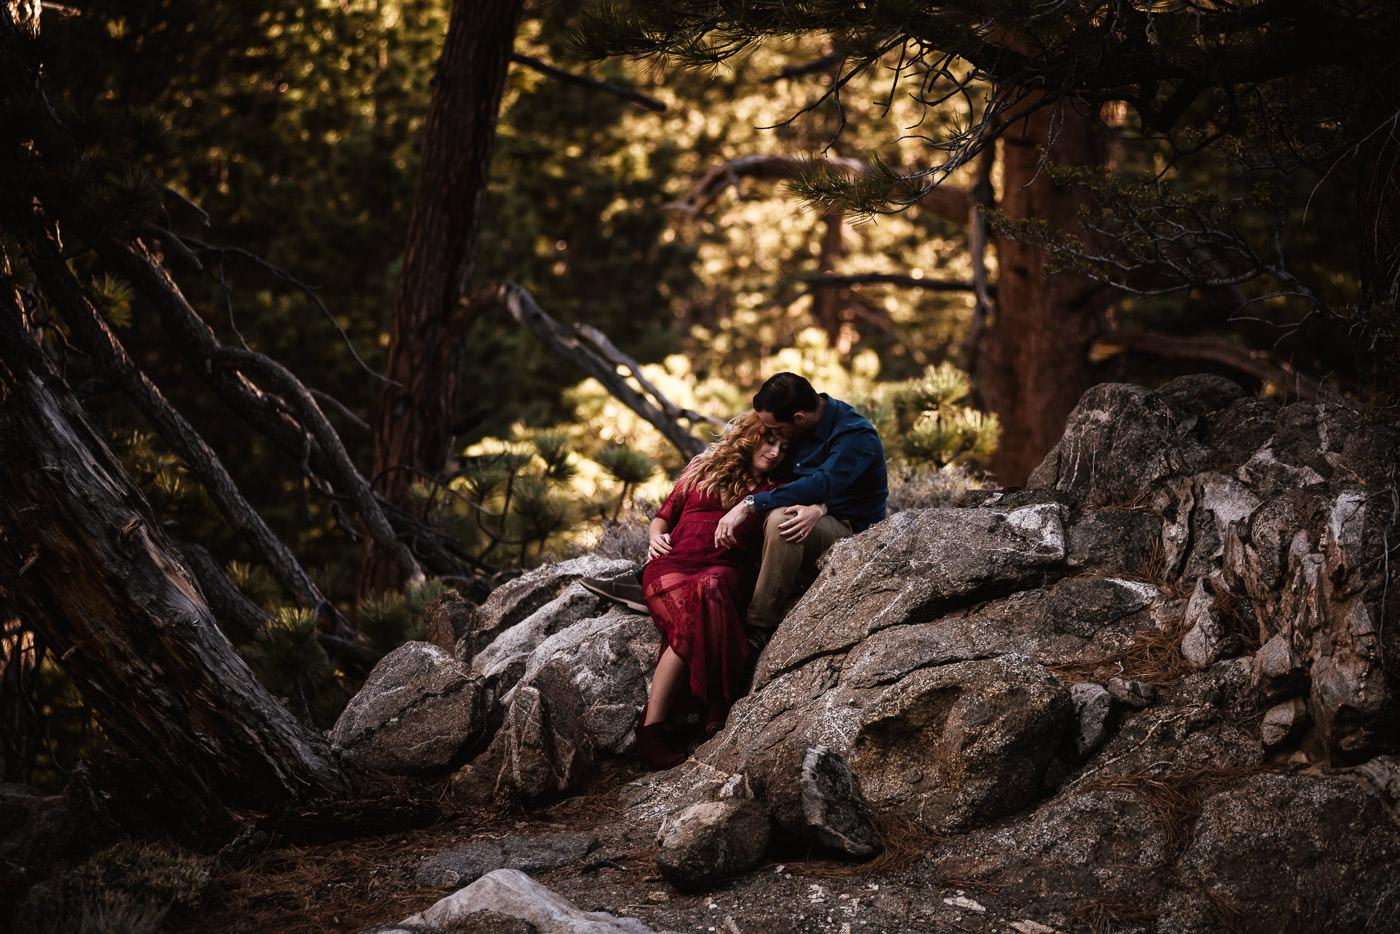 Engagement photographer captures romantic moment between bride and groom.